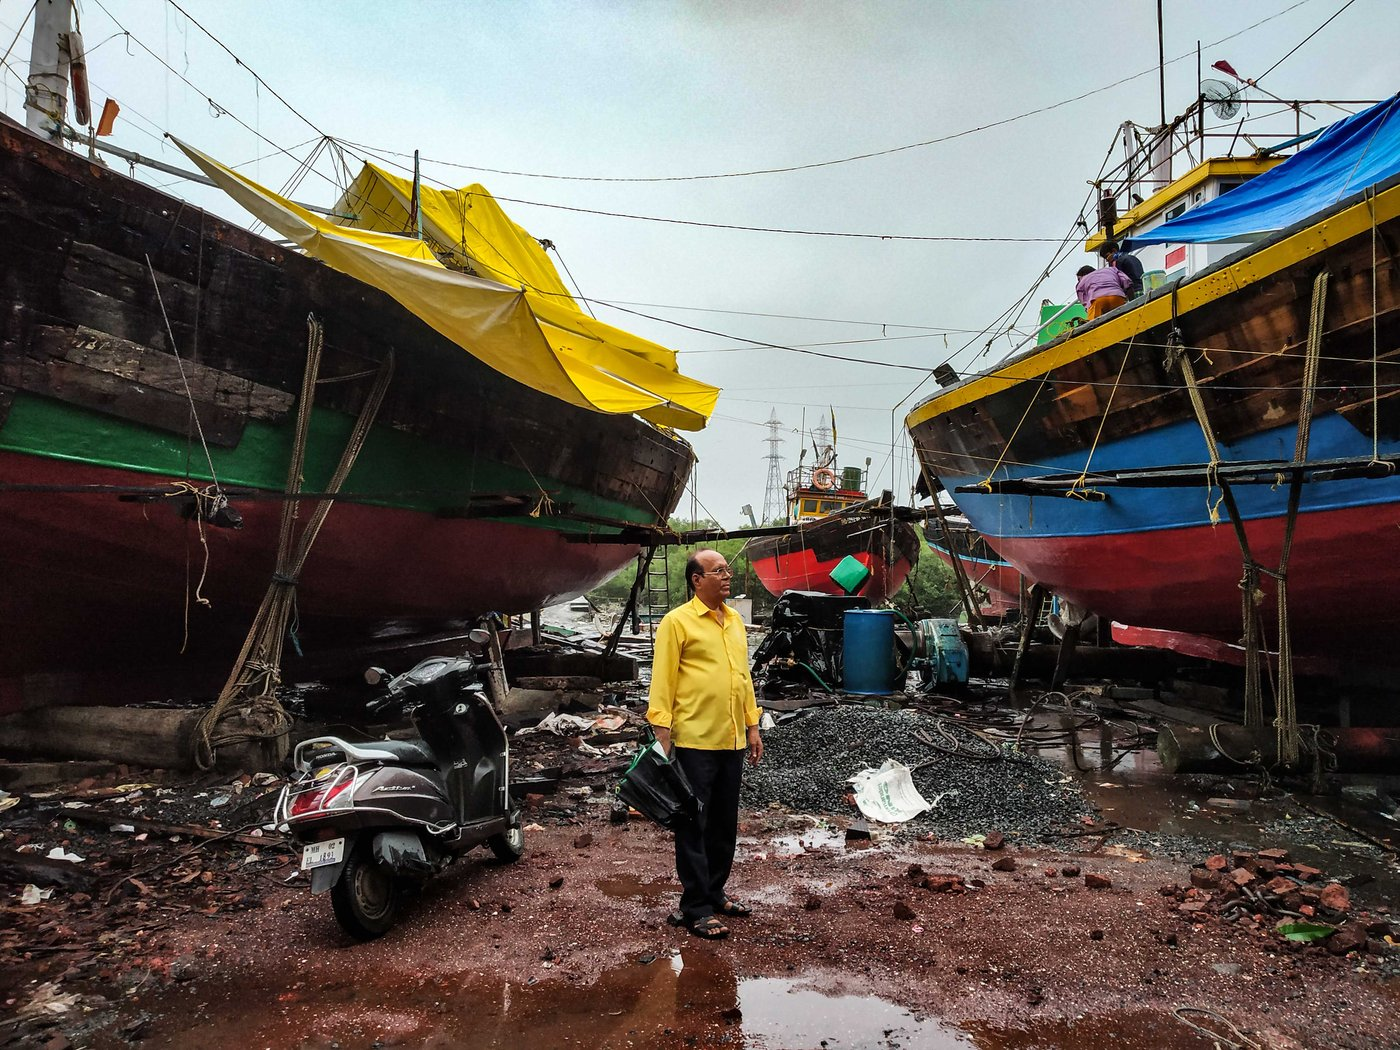 Bhagwan Bhanji in a yard where trawlers are repaired, at the southern end of Versova Koliwada